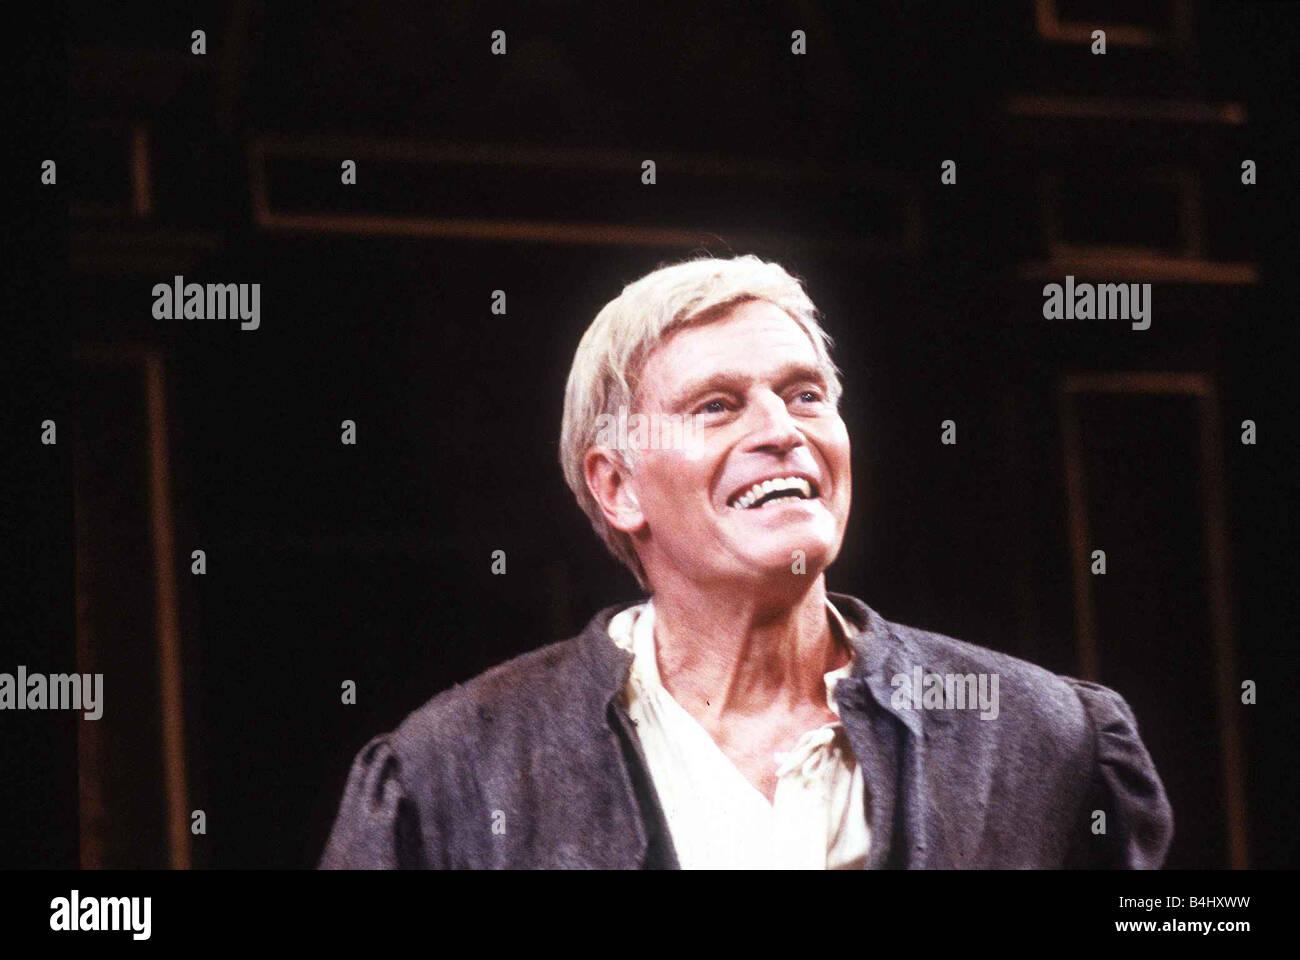 Charlton Heston Actor at the Savoy Theatre as Sir Thomas Moore October 1987 Dbase MSI - Stock Image